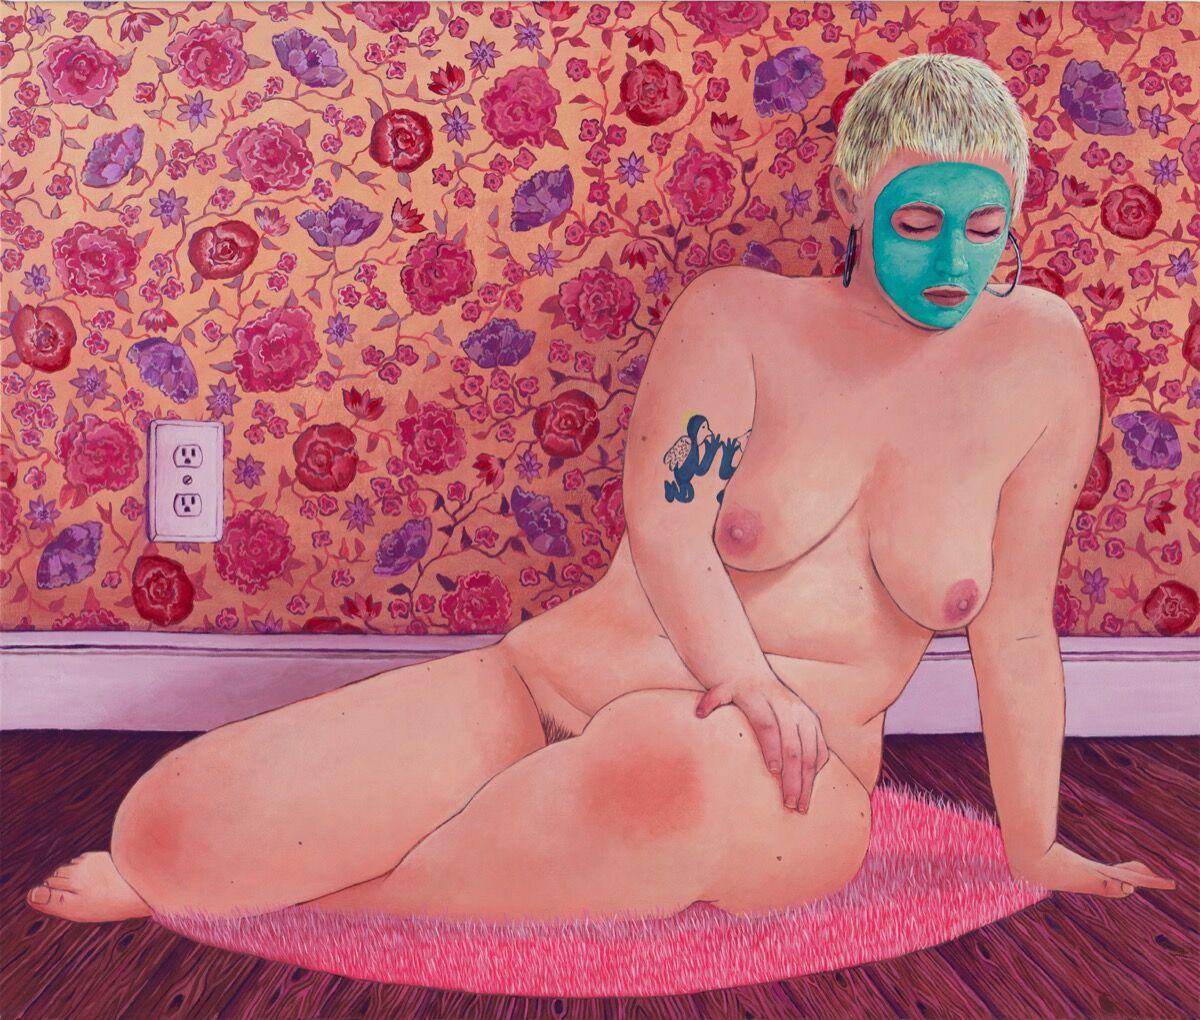 Shona McAndrew, Alyssa, 2019. Courtesy of the artist and CHART.